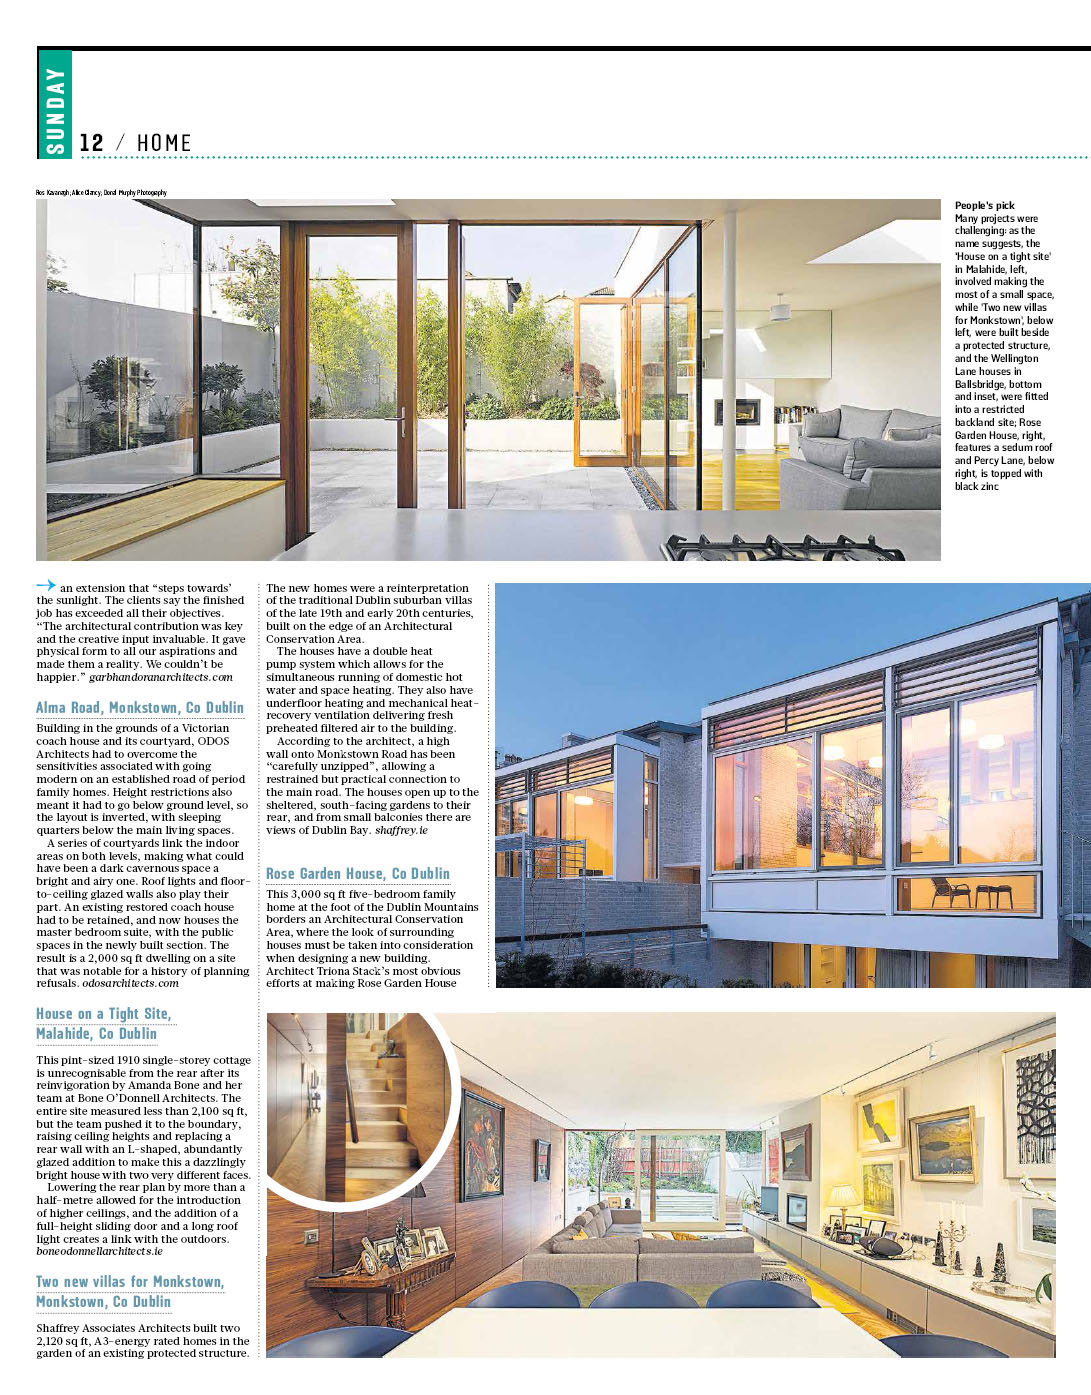 Sunday Times page 4.jpg